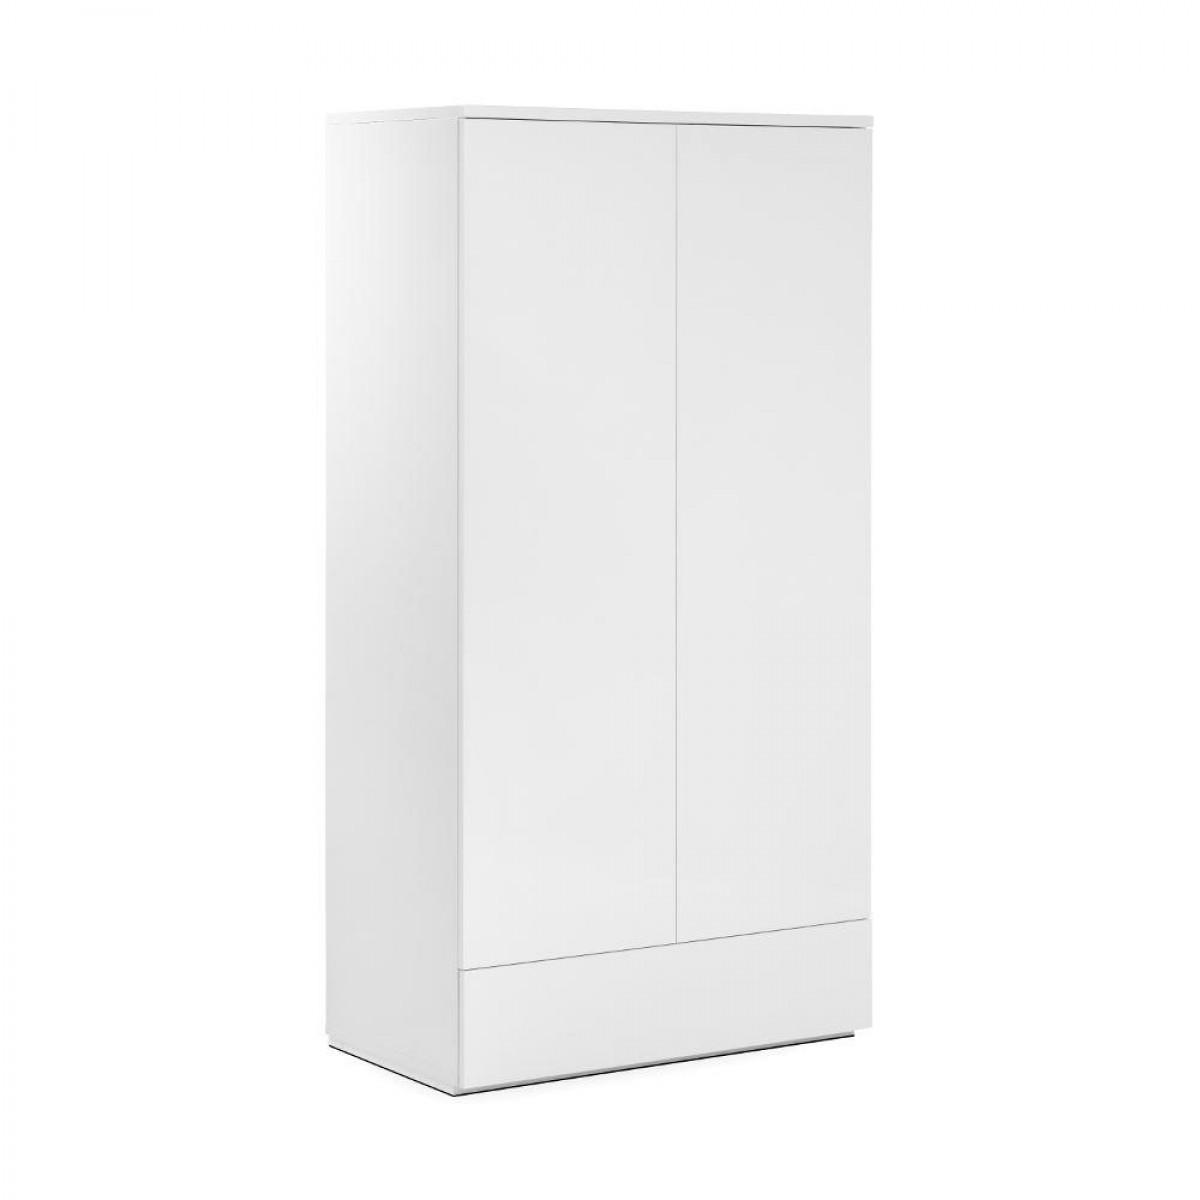 Monaco White Wooden High Gloss Combination Wardrobe